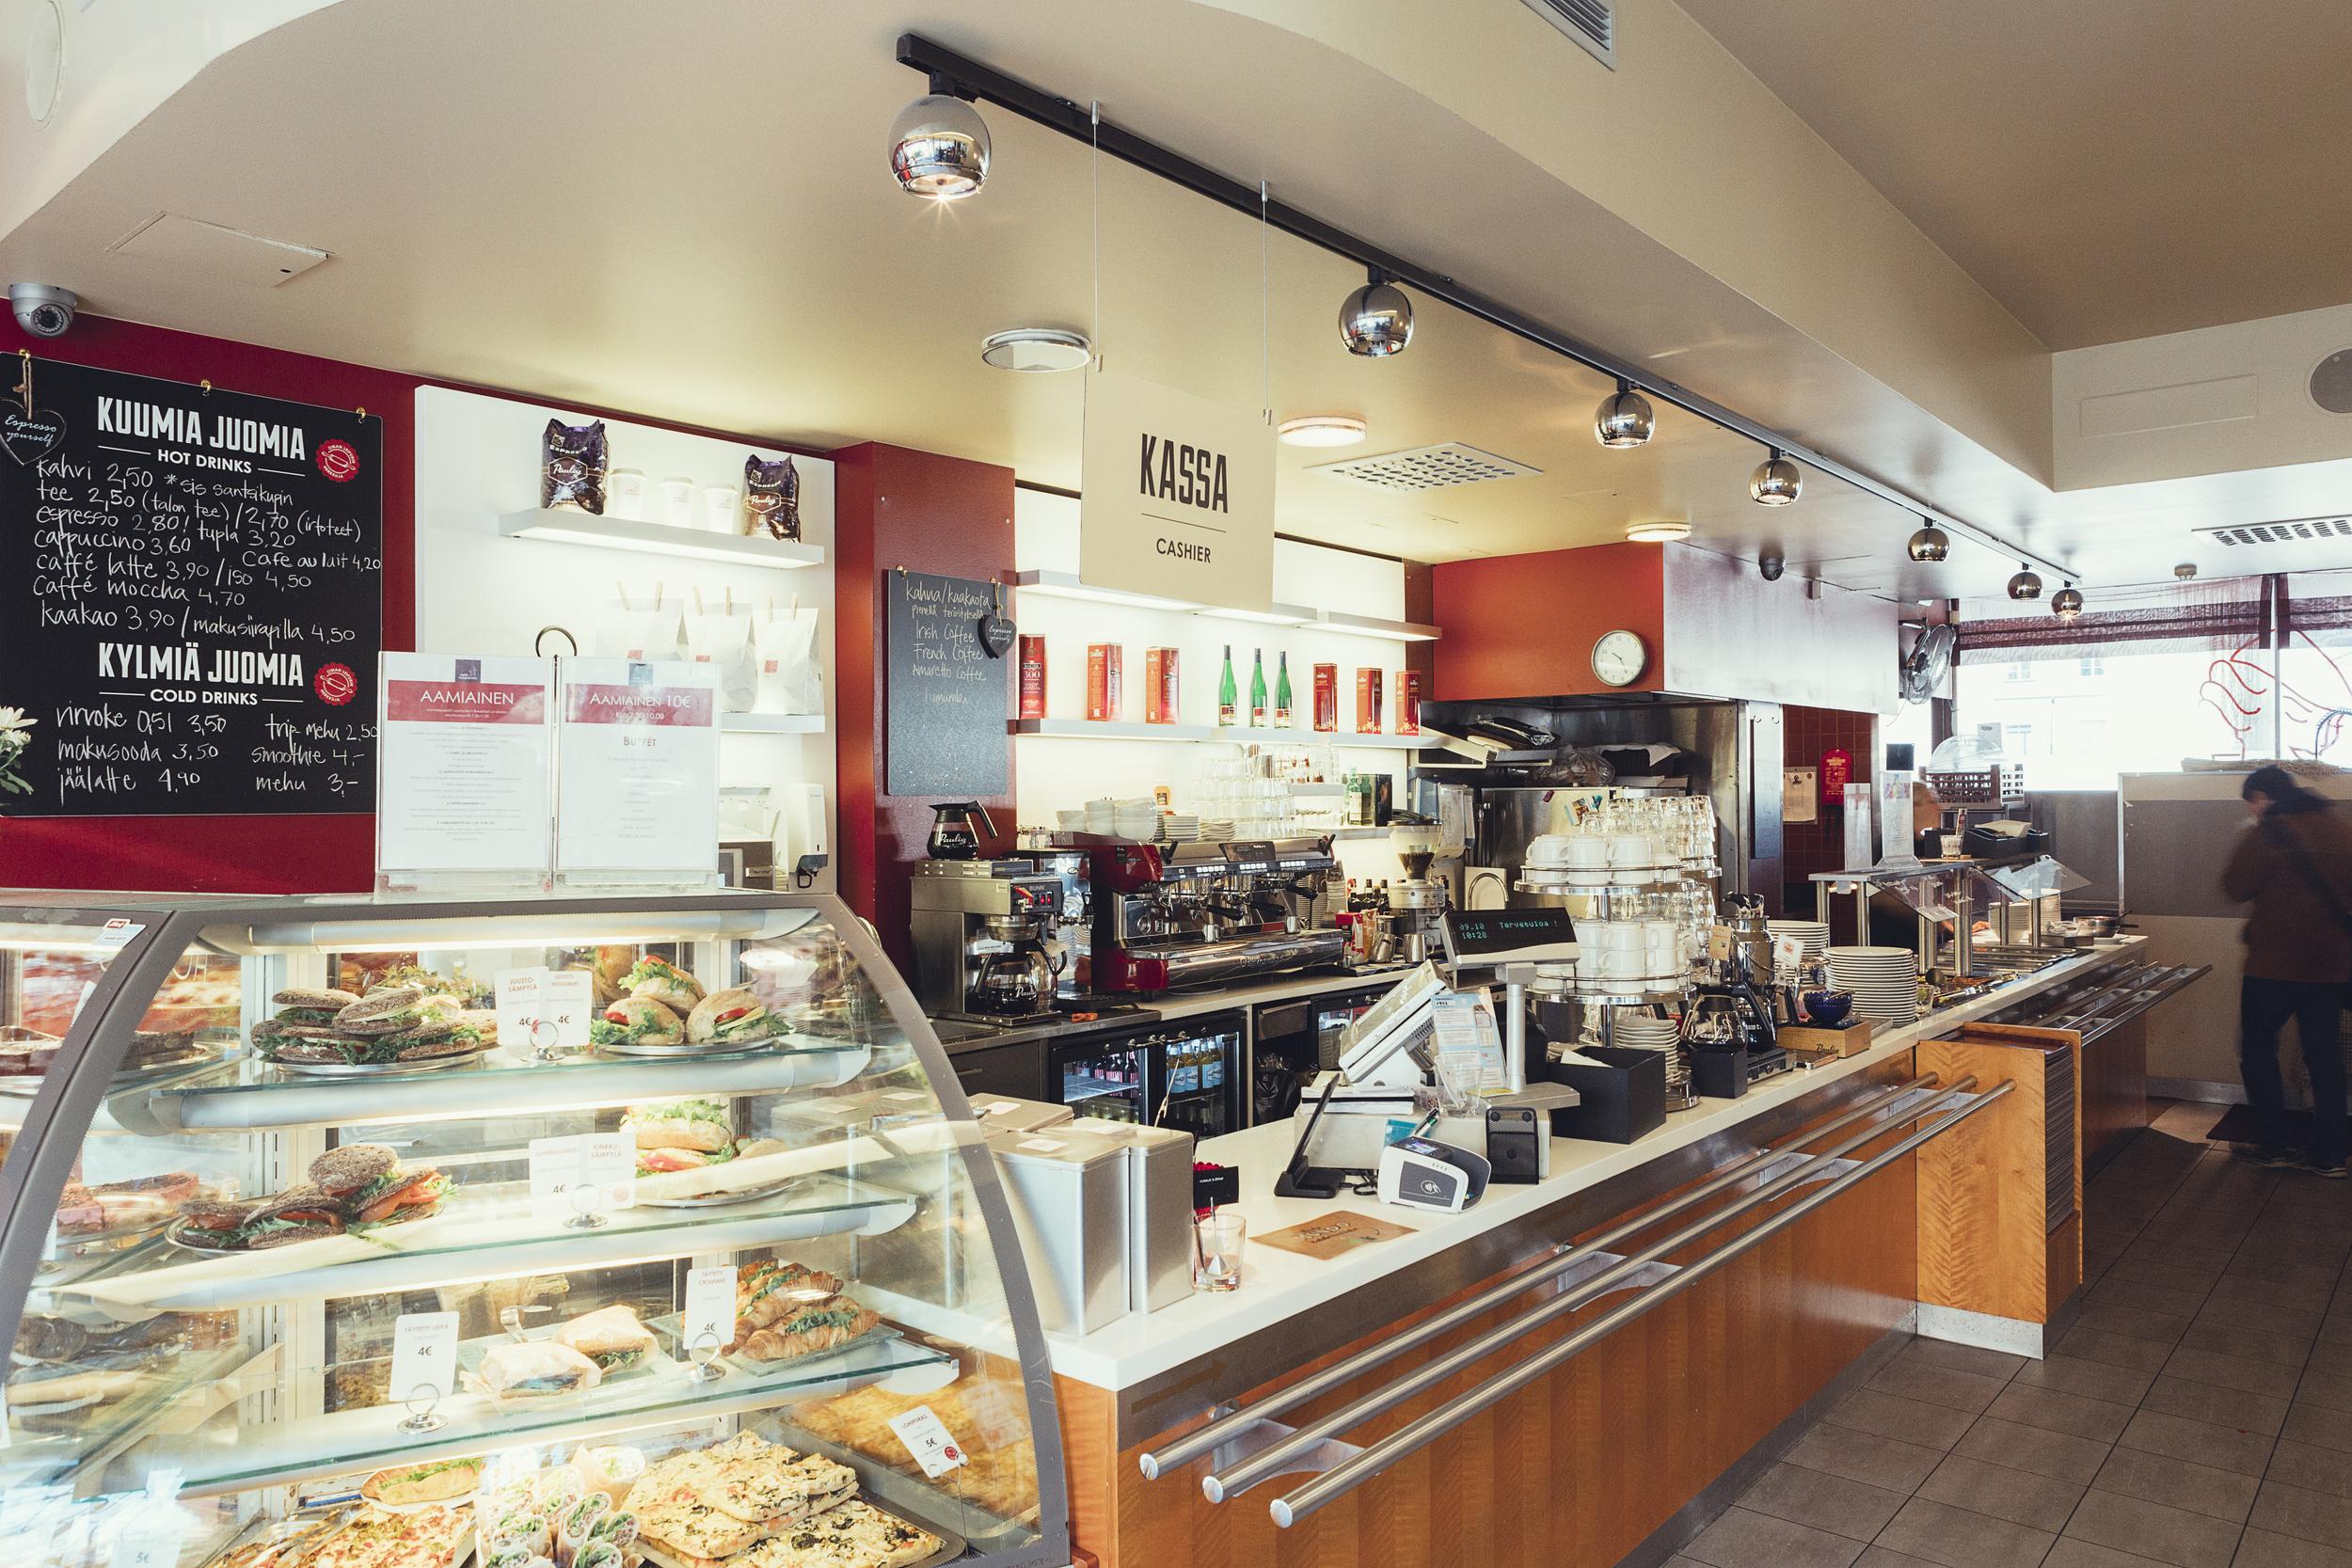 Inside Cafe Lasipalatsi